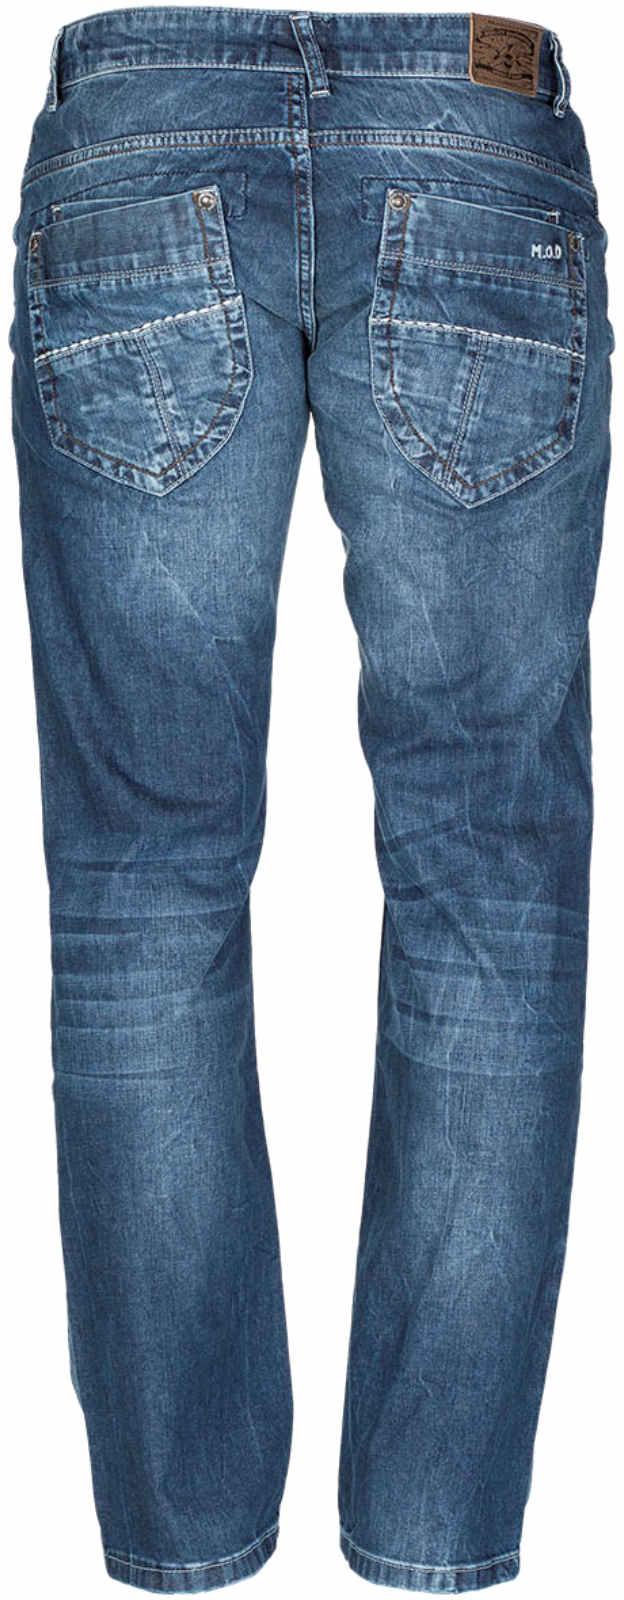 m o d herren jeans joshua comfort sp14 1006 low waist neu. Black Bedroom Furniture Sets. Home Design Ideas